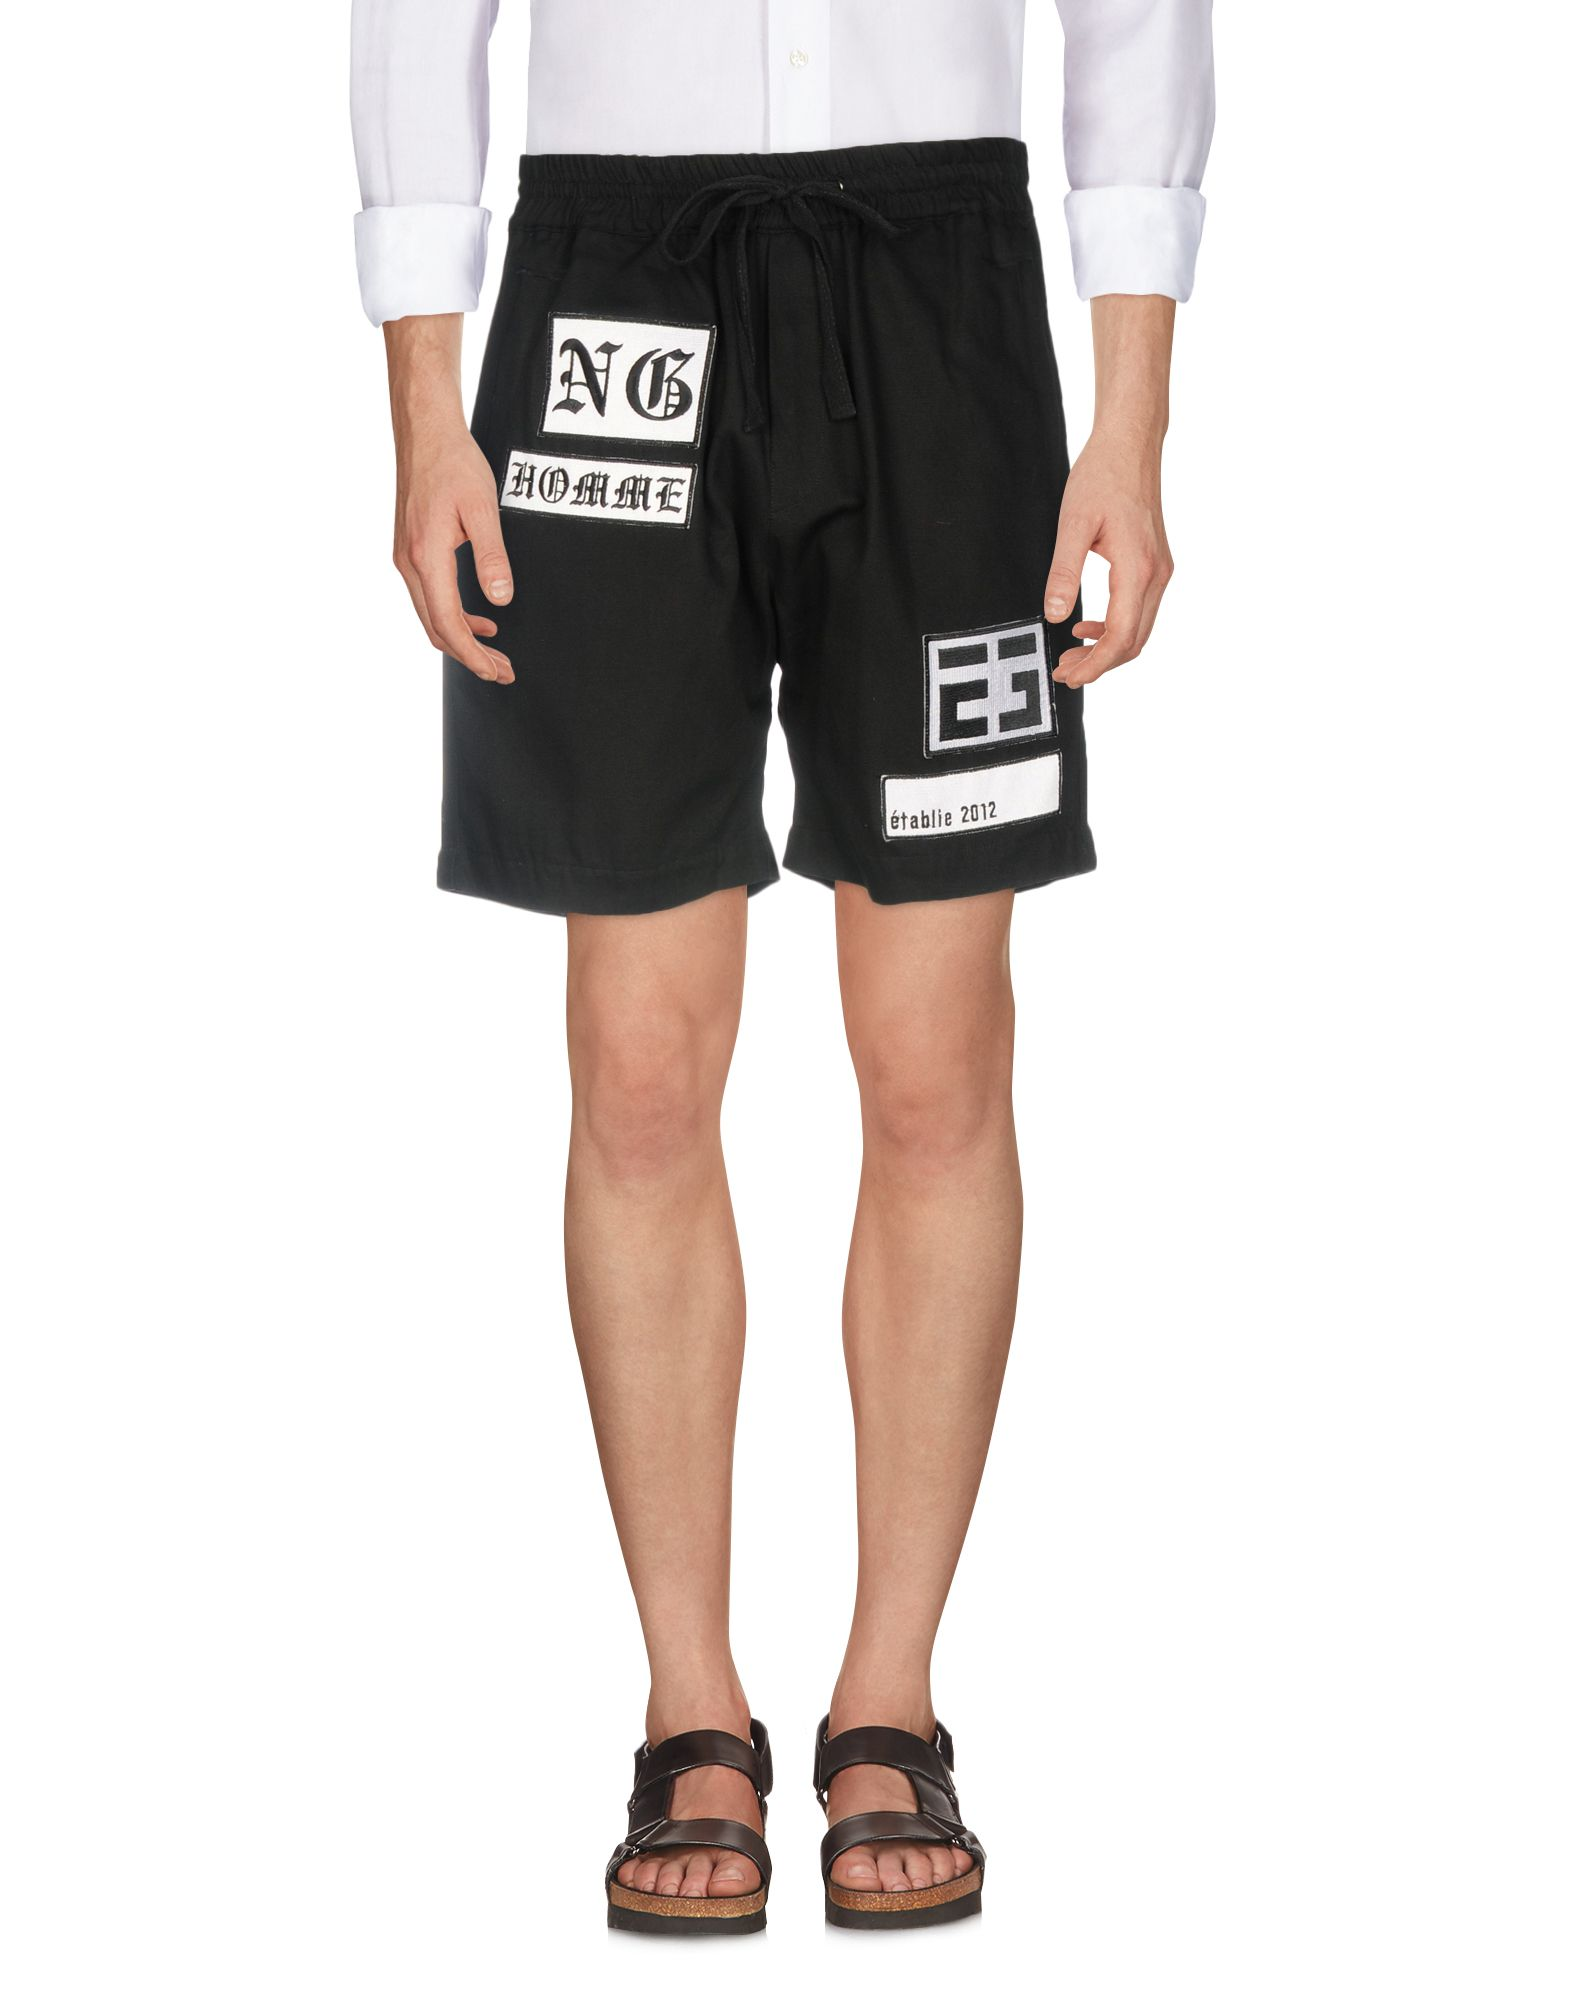 NOT GUILTY HOMME Shorts & Bermuda in Black